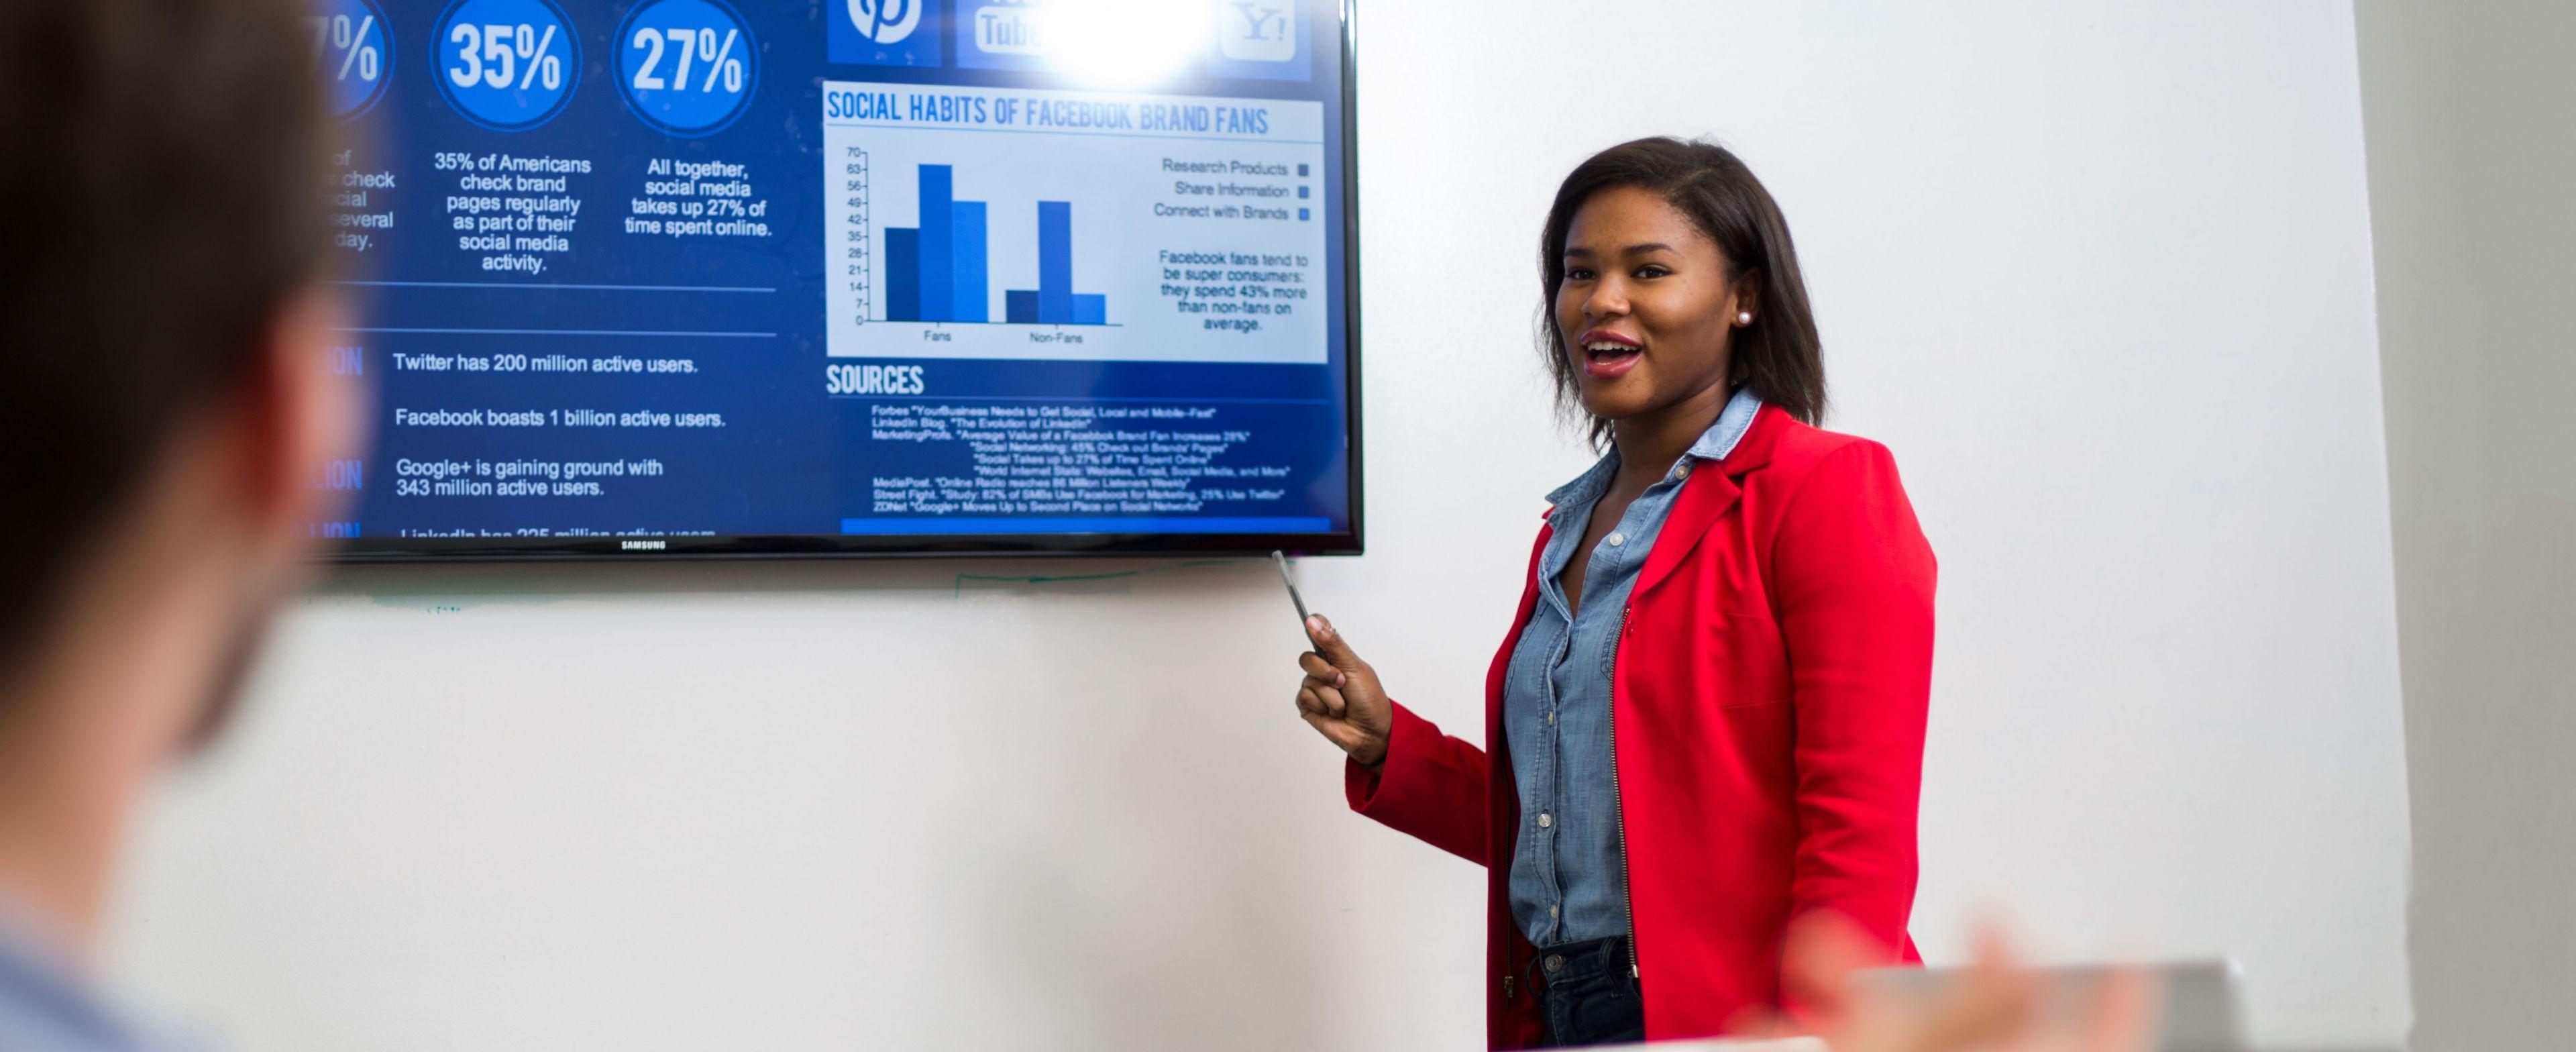 Bachelor Of Science In Strategic Communication Social Media Management